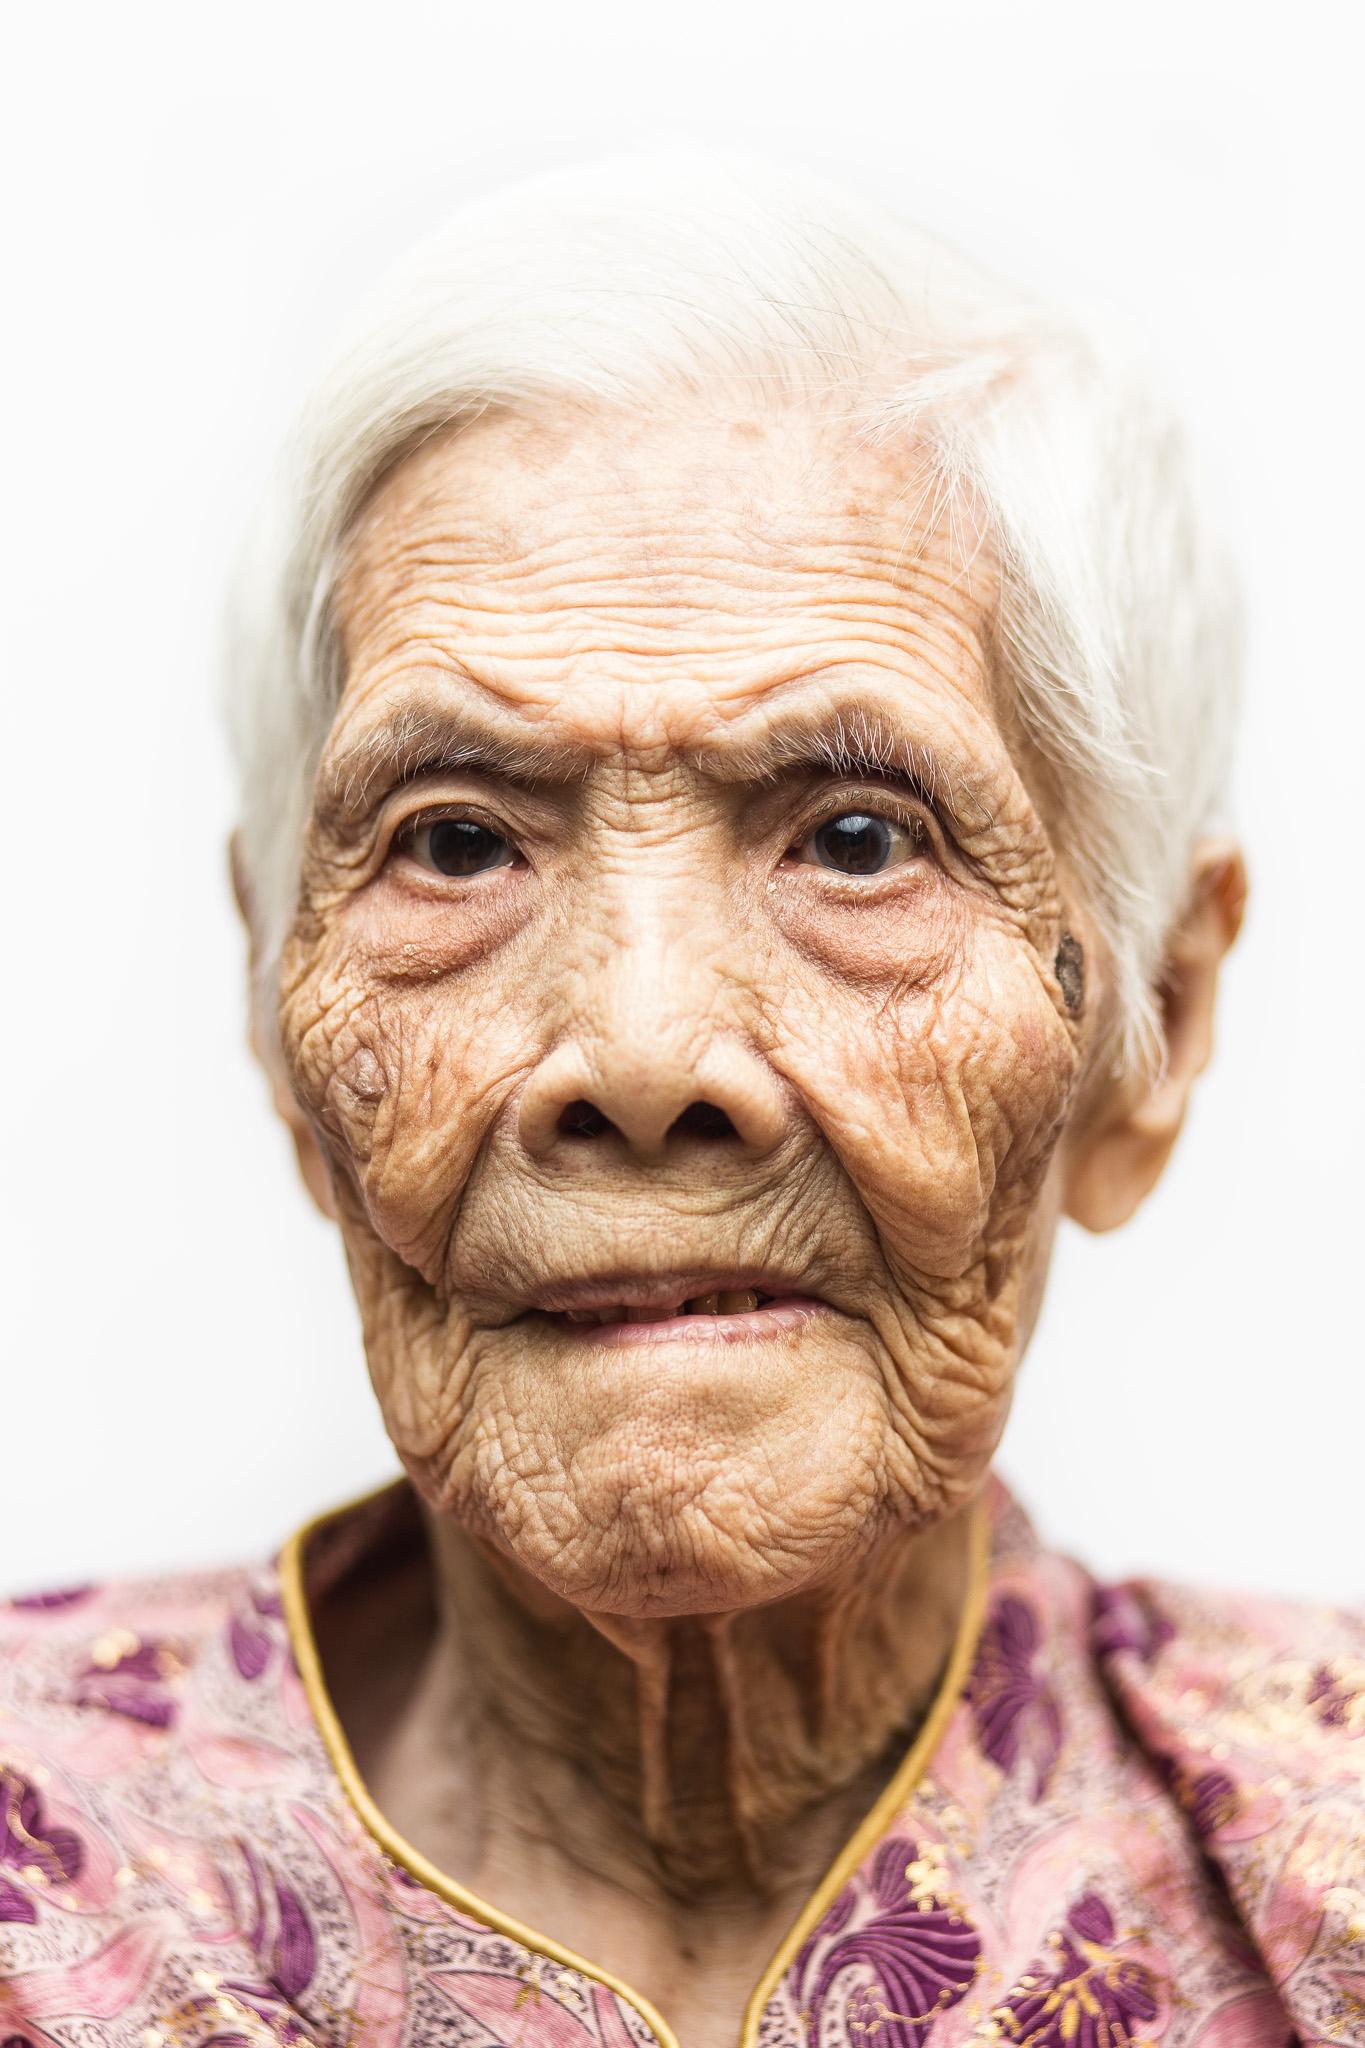 zainal-zainal-studio-centenarians-care-duke-nus-singapore-photographer-15.jpg